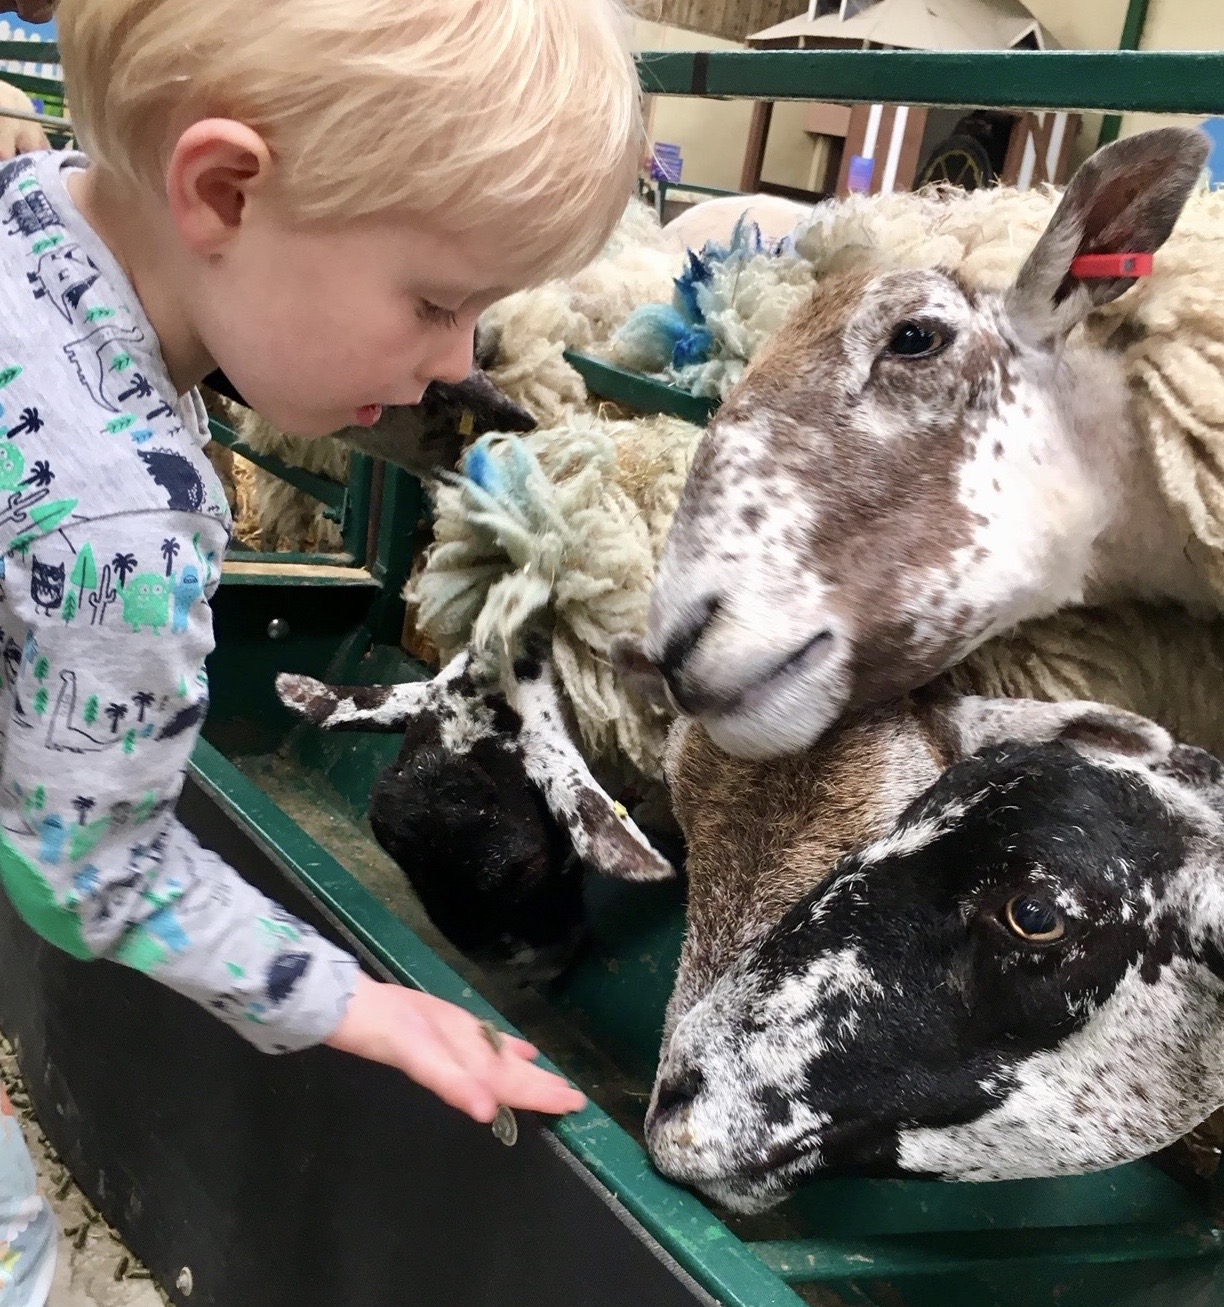 Fun feeding the animals at The Big Sheep in Cornwall